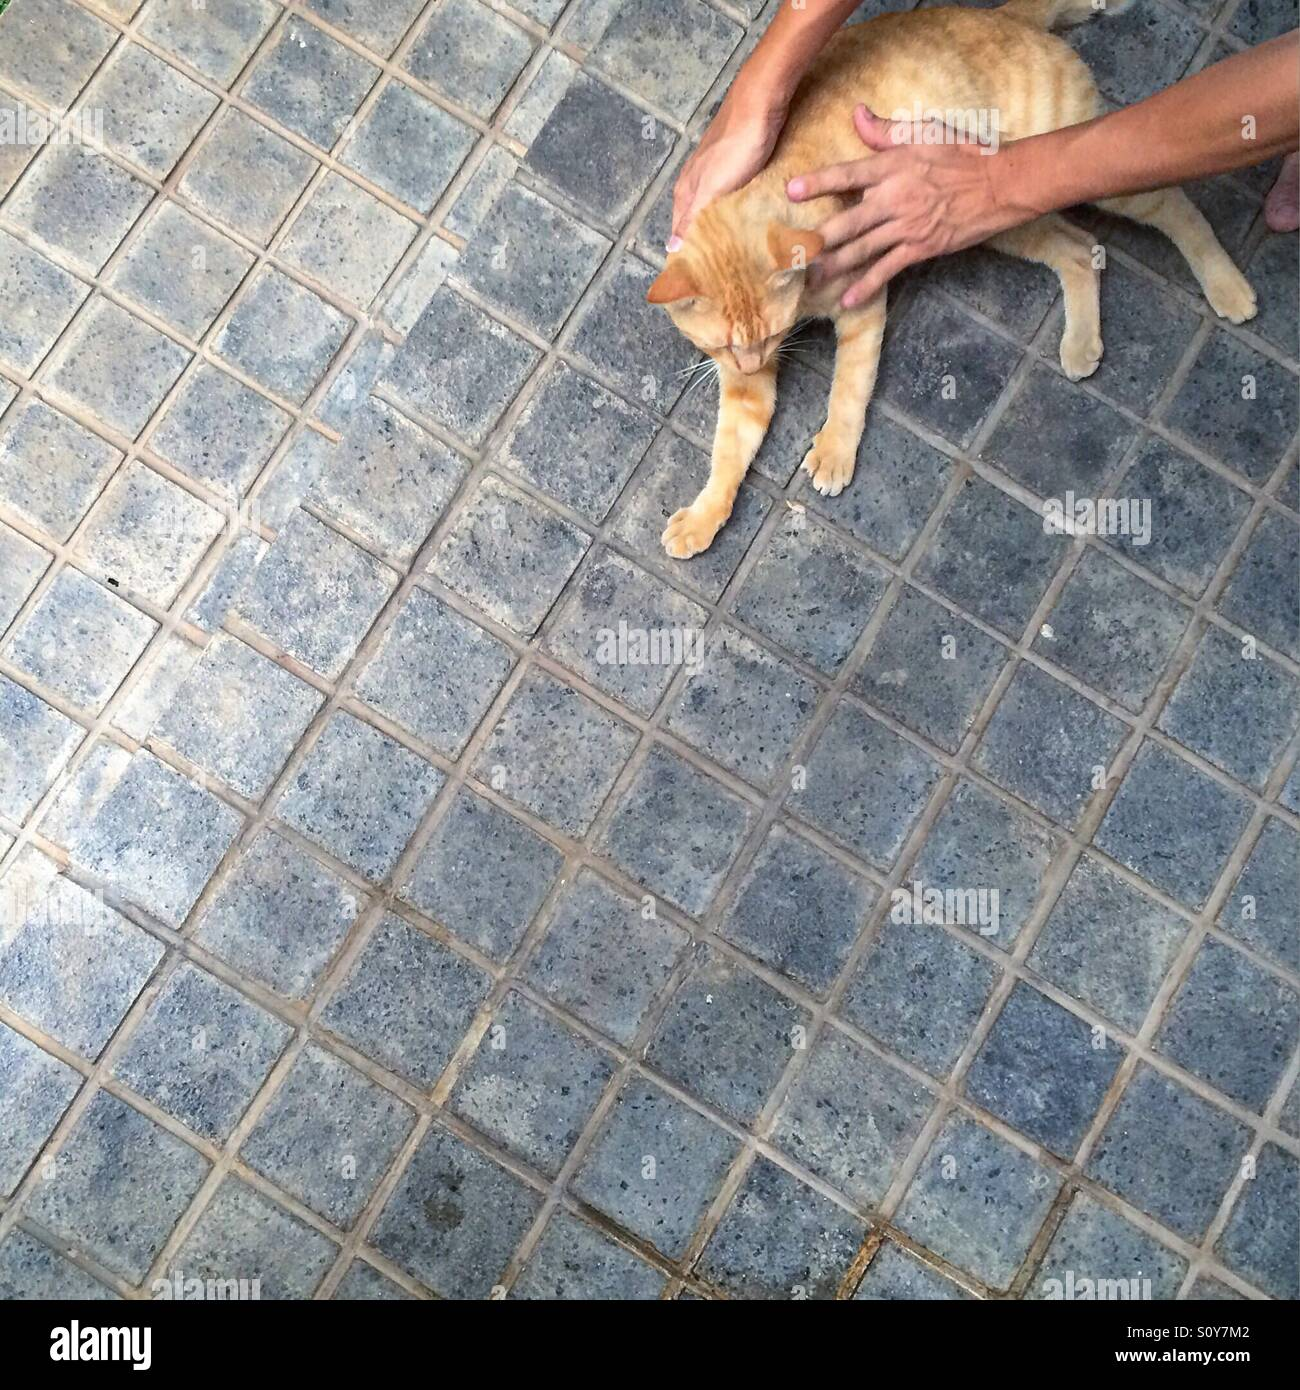 Persona de acariciar a un gato de color naranja. Imagen De Stock